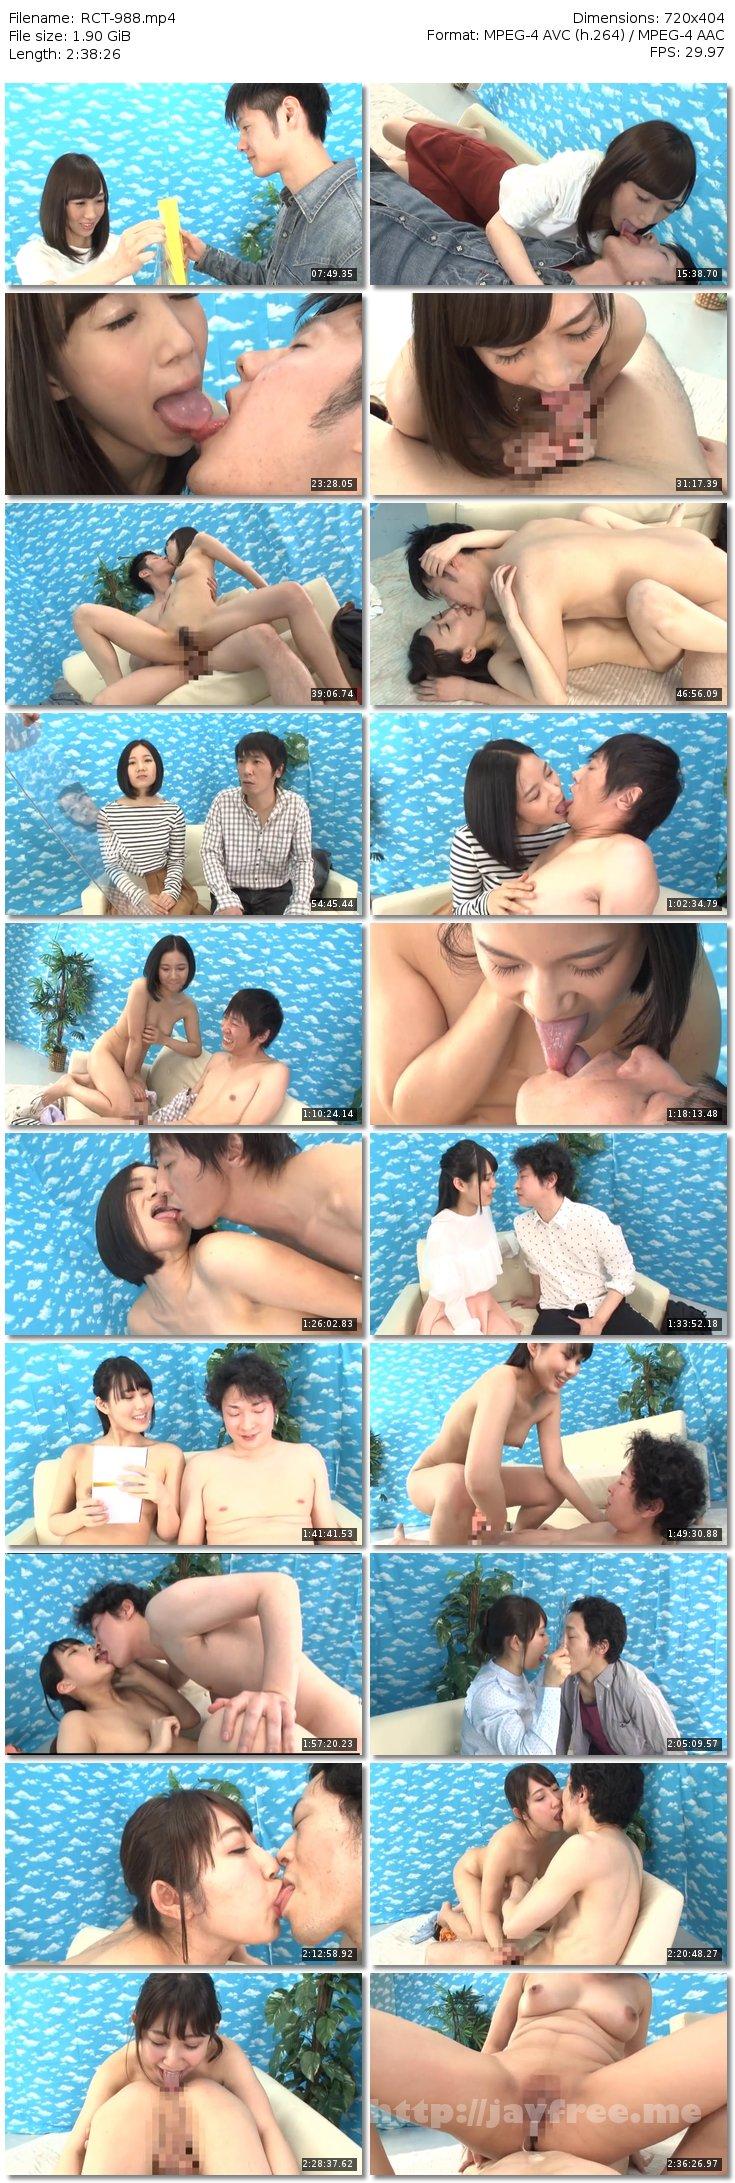 [S2MCR-04] Model Collection Remix 04 : ふわりゆうき, 相島奈央, 本多成実 ( ブルーレイ版 ) - image RCT-988 on http://javcc.com